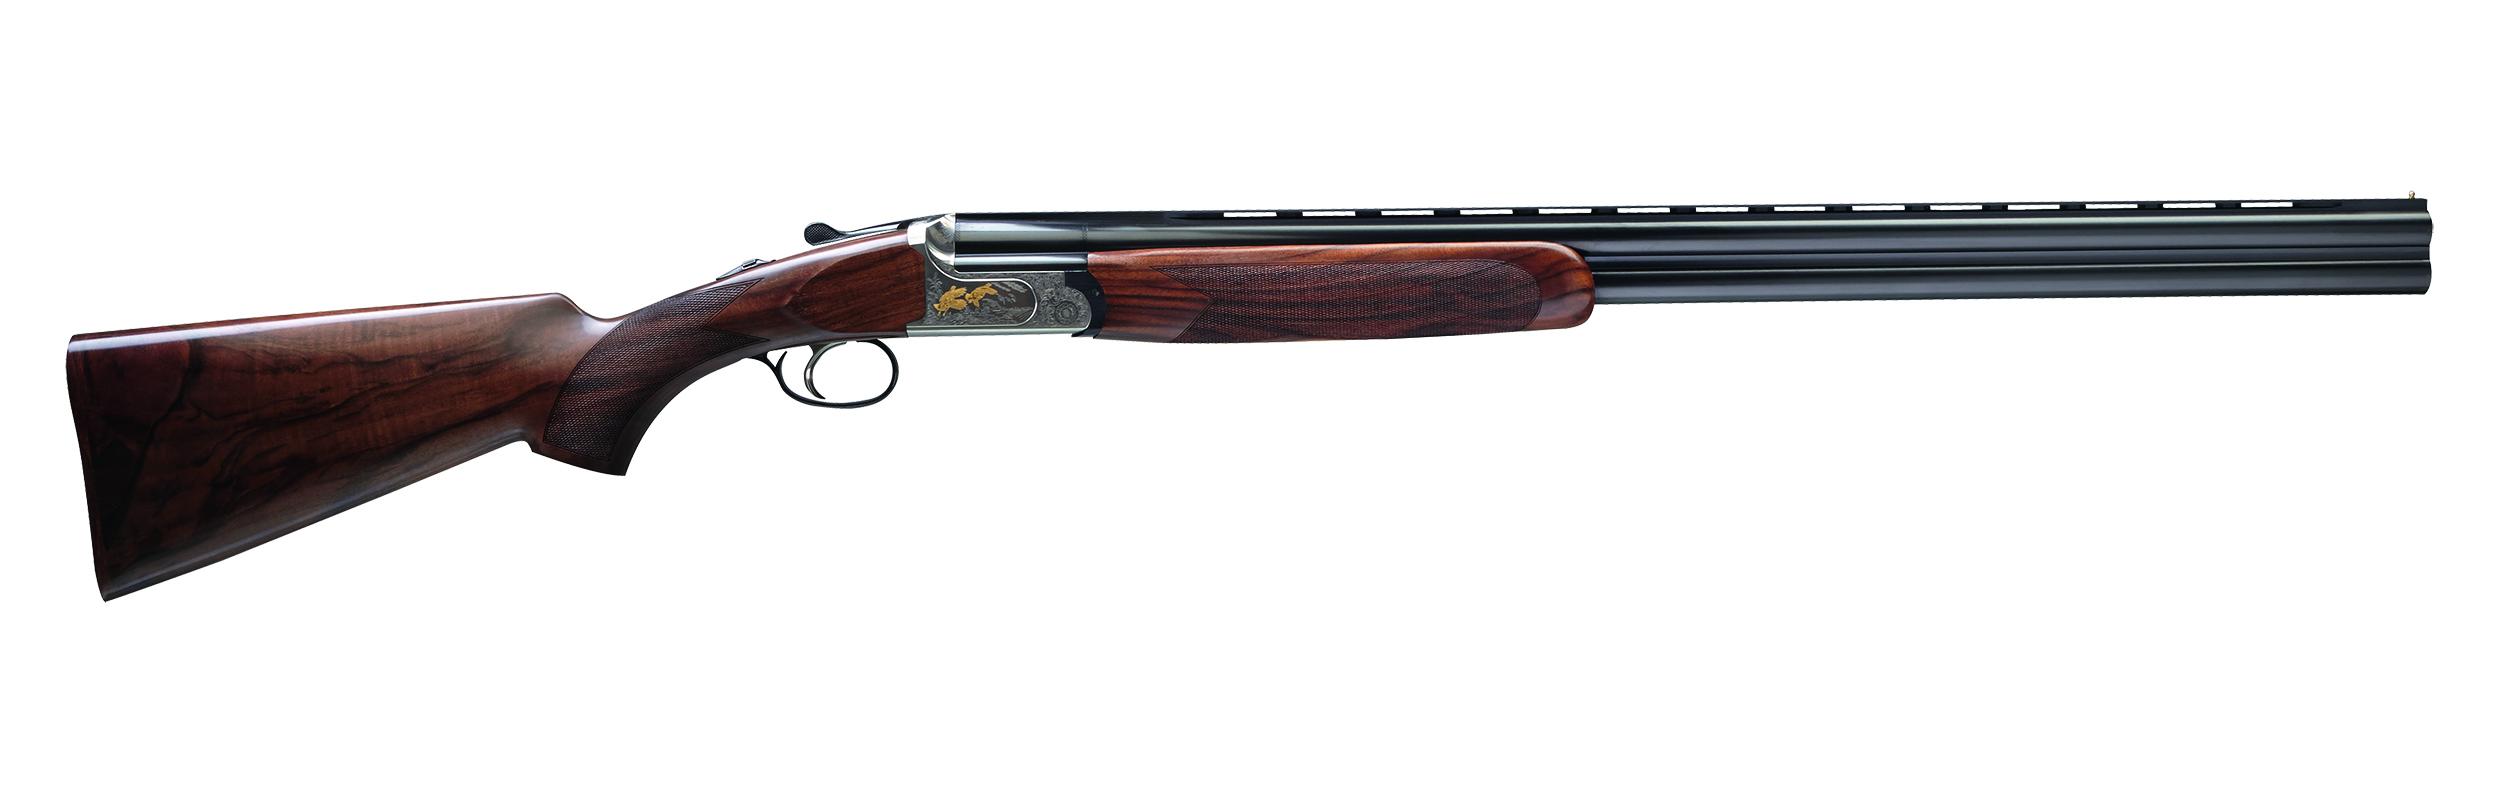 shooting Shotgun holder// clay shooting skeet LightGun Sporter gun holster